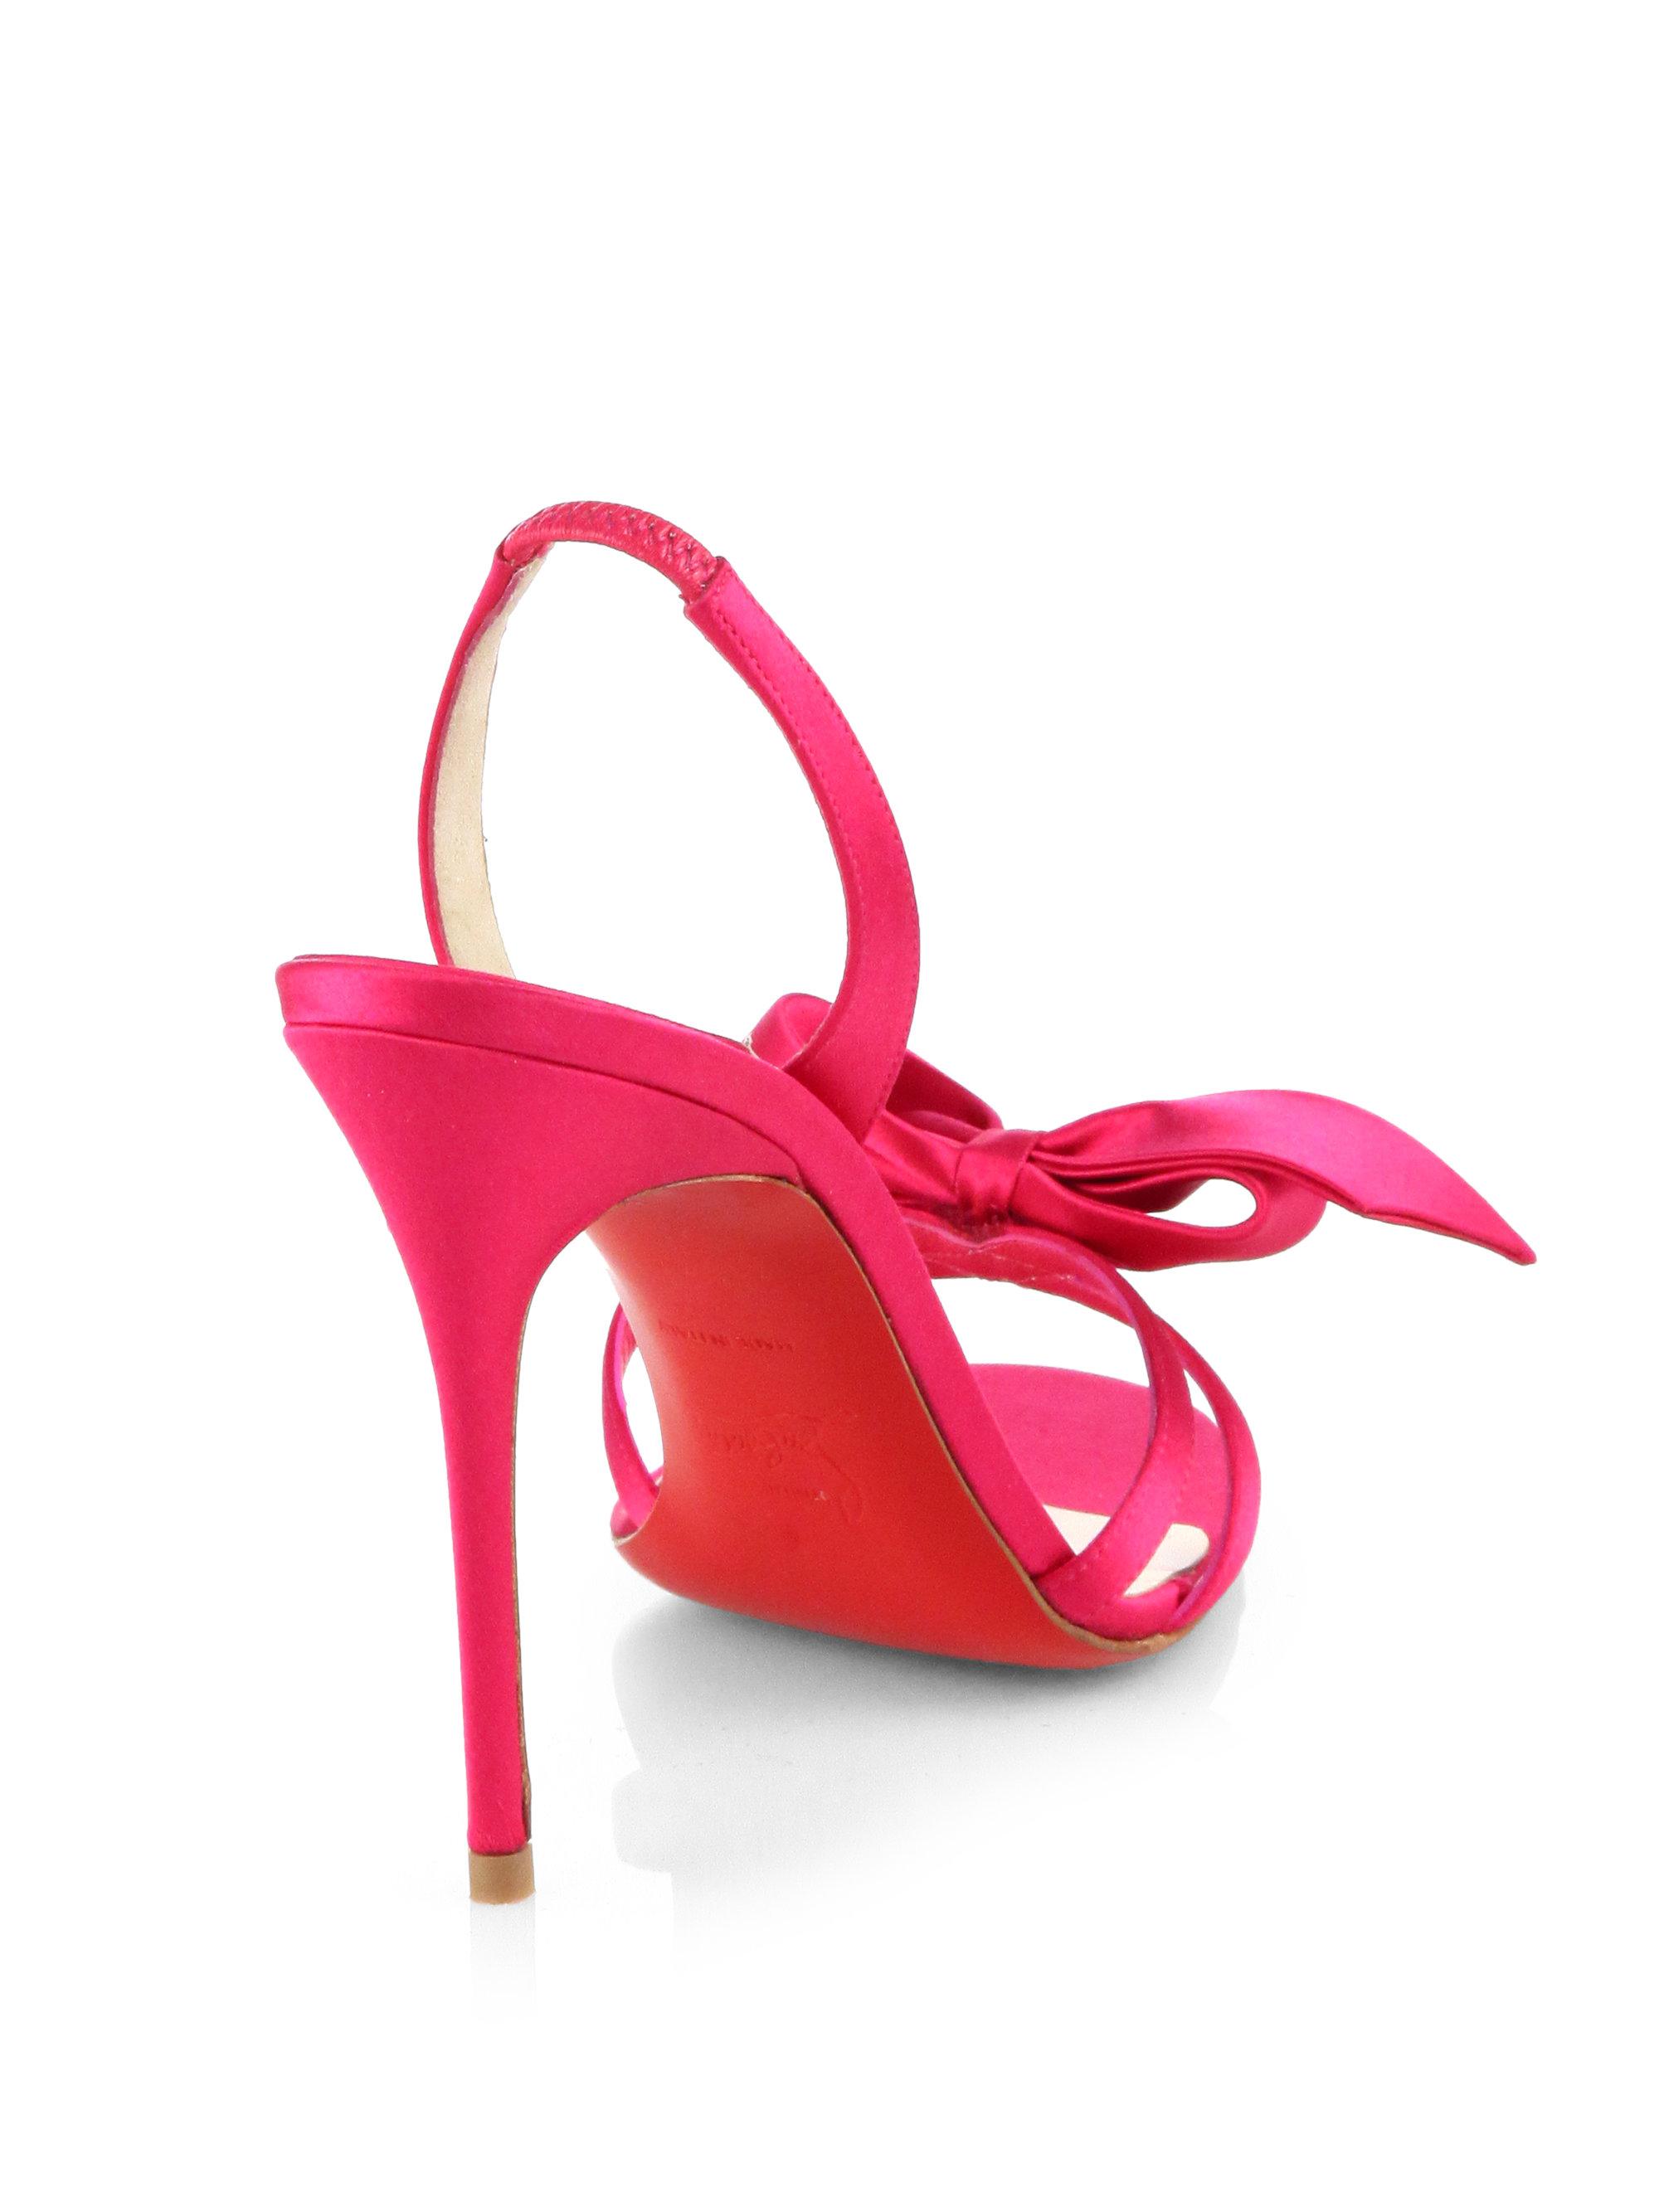 promo code 6992e a82f5 sweden christian louboutin satin bow sandal 6e0a9 cdf03